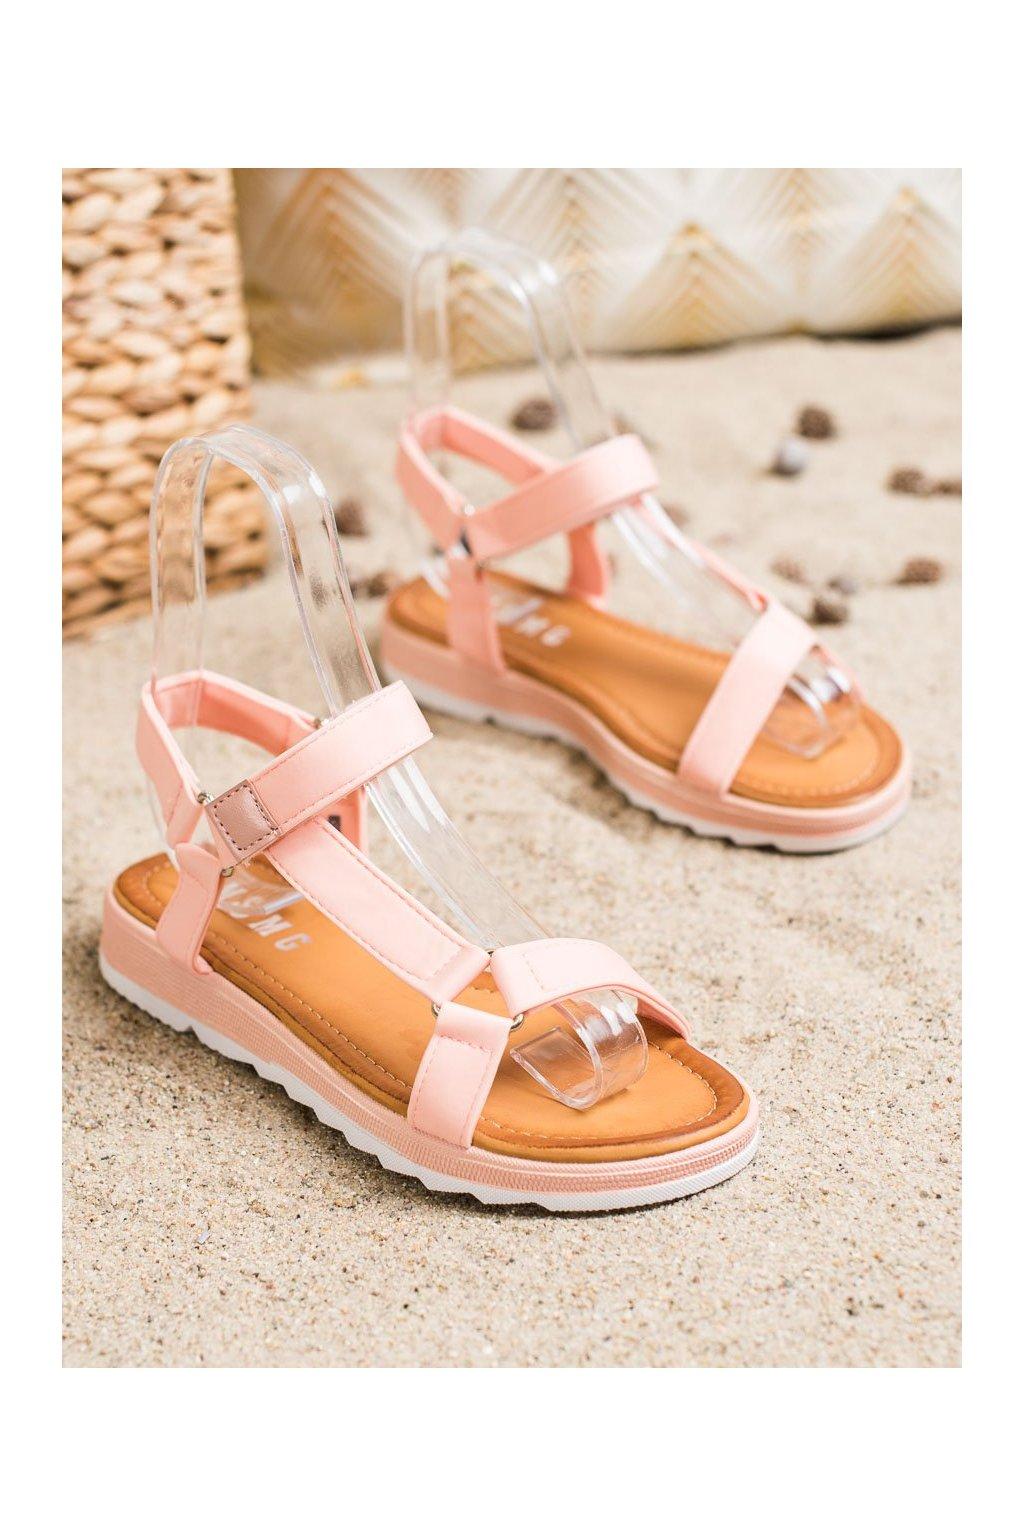 Ružové sandále NJSK WS9027P